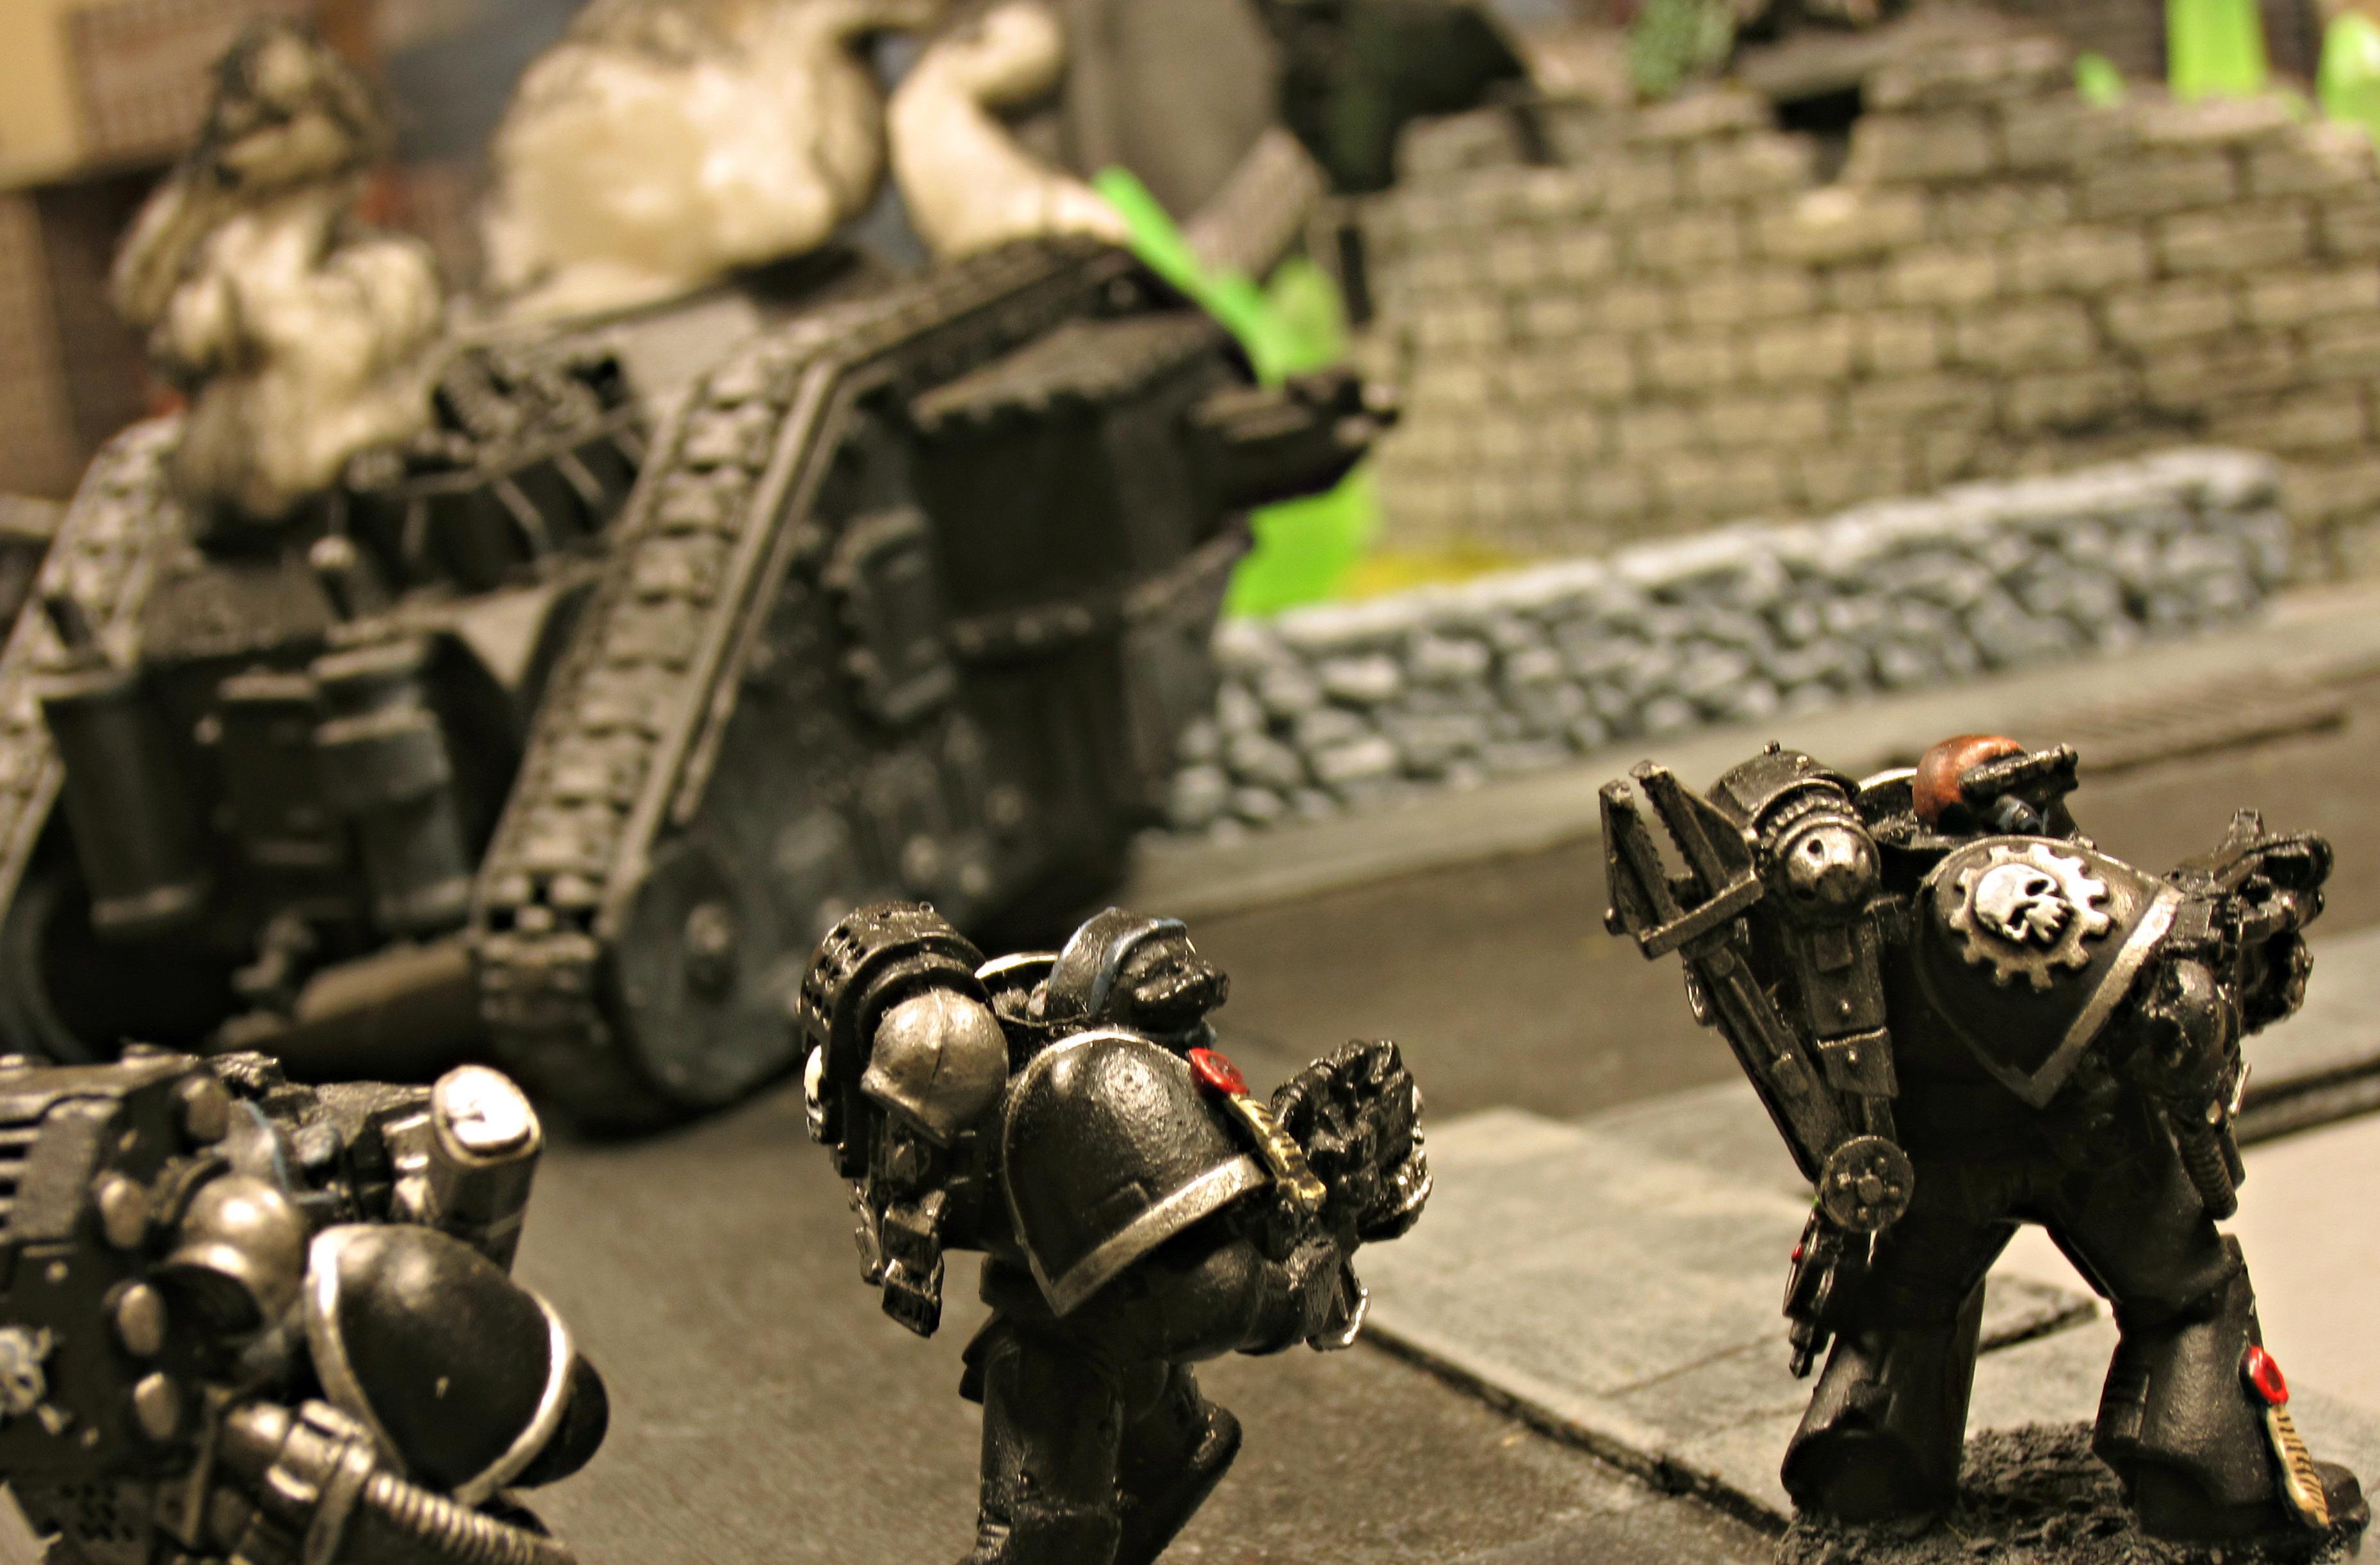 Alien Hunter, Alien Hunters, Black Shields, Blackshields, Death Watch, Deathwatch, Inquisition, Kill Team, Killteam, Ordos Xenos